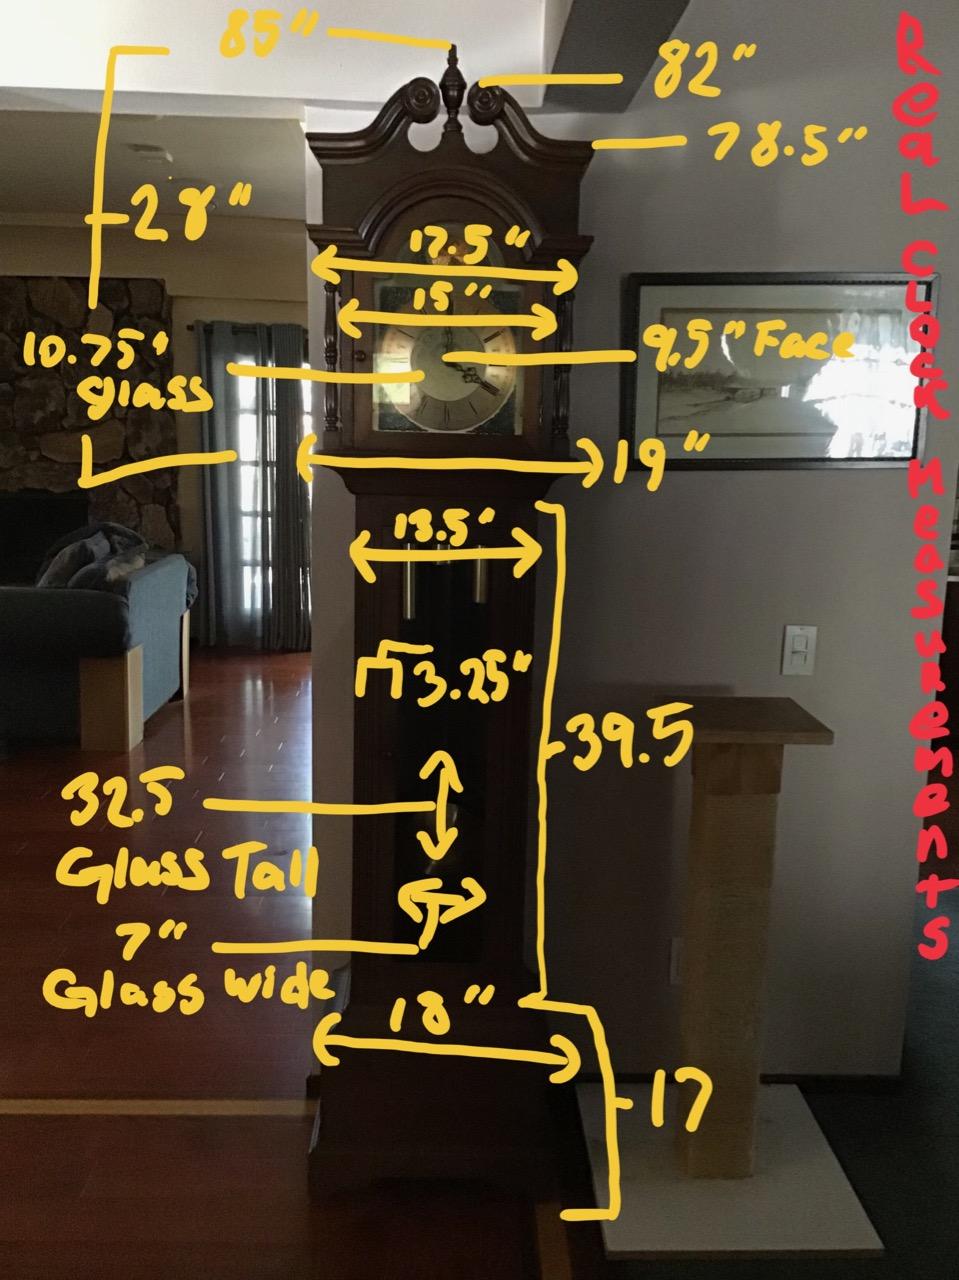 measurements_parentsclock.jpg